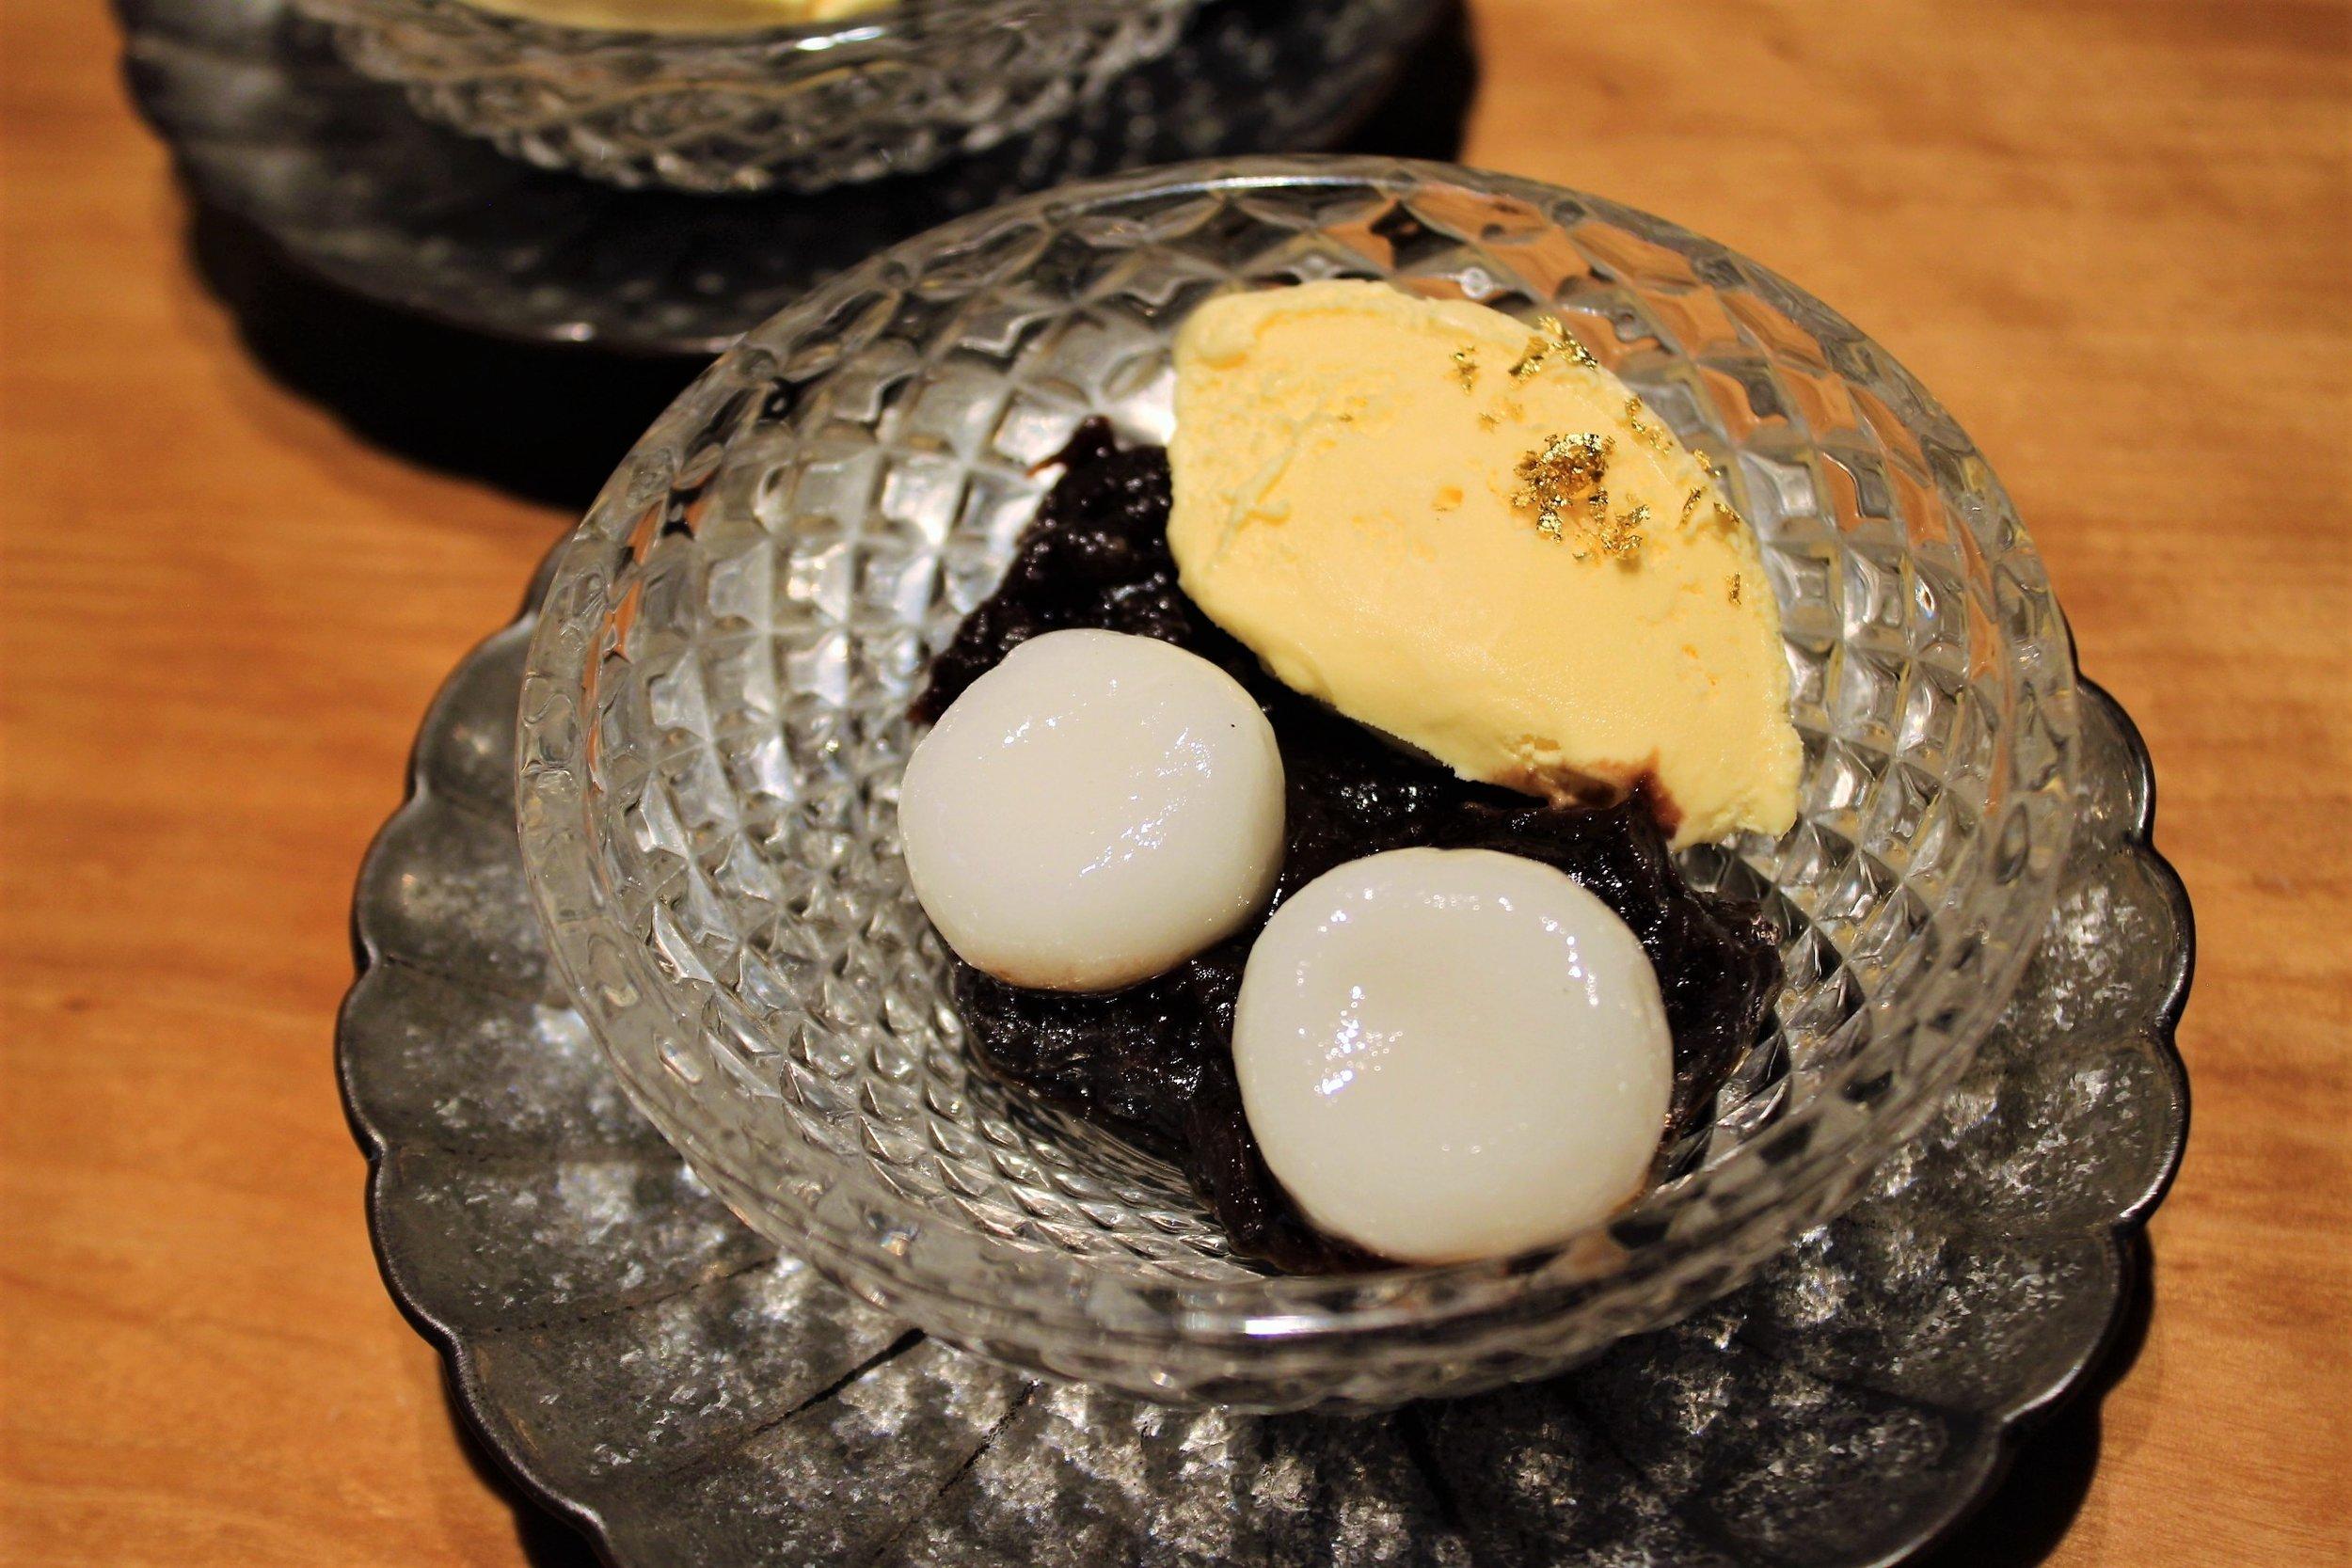 Cream Shiratama Zenzai Azuki Beans with Mochi Ball and Vanilla at Kien in Tokyo, Japan